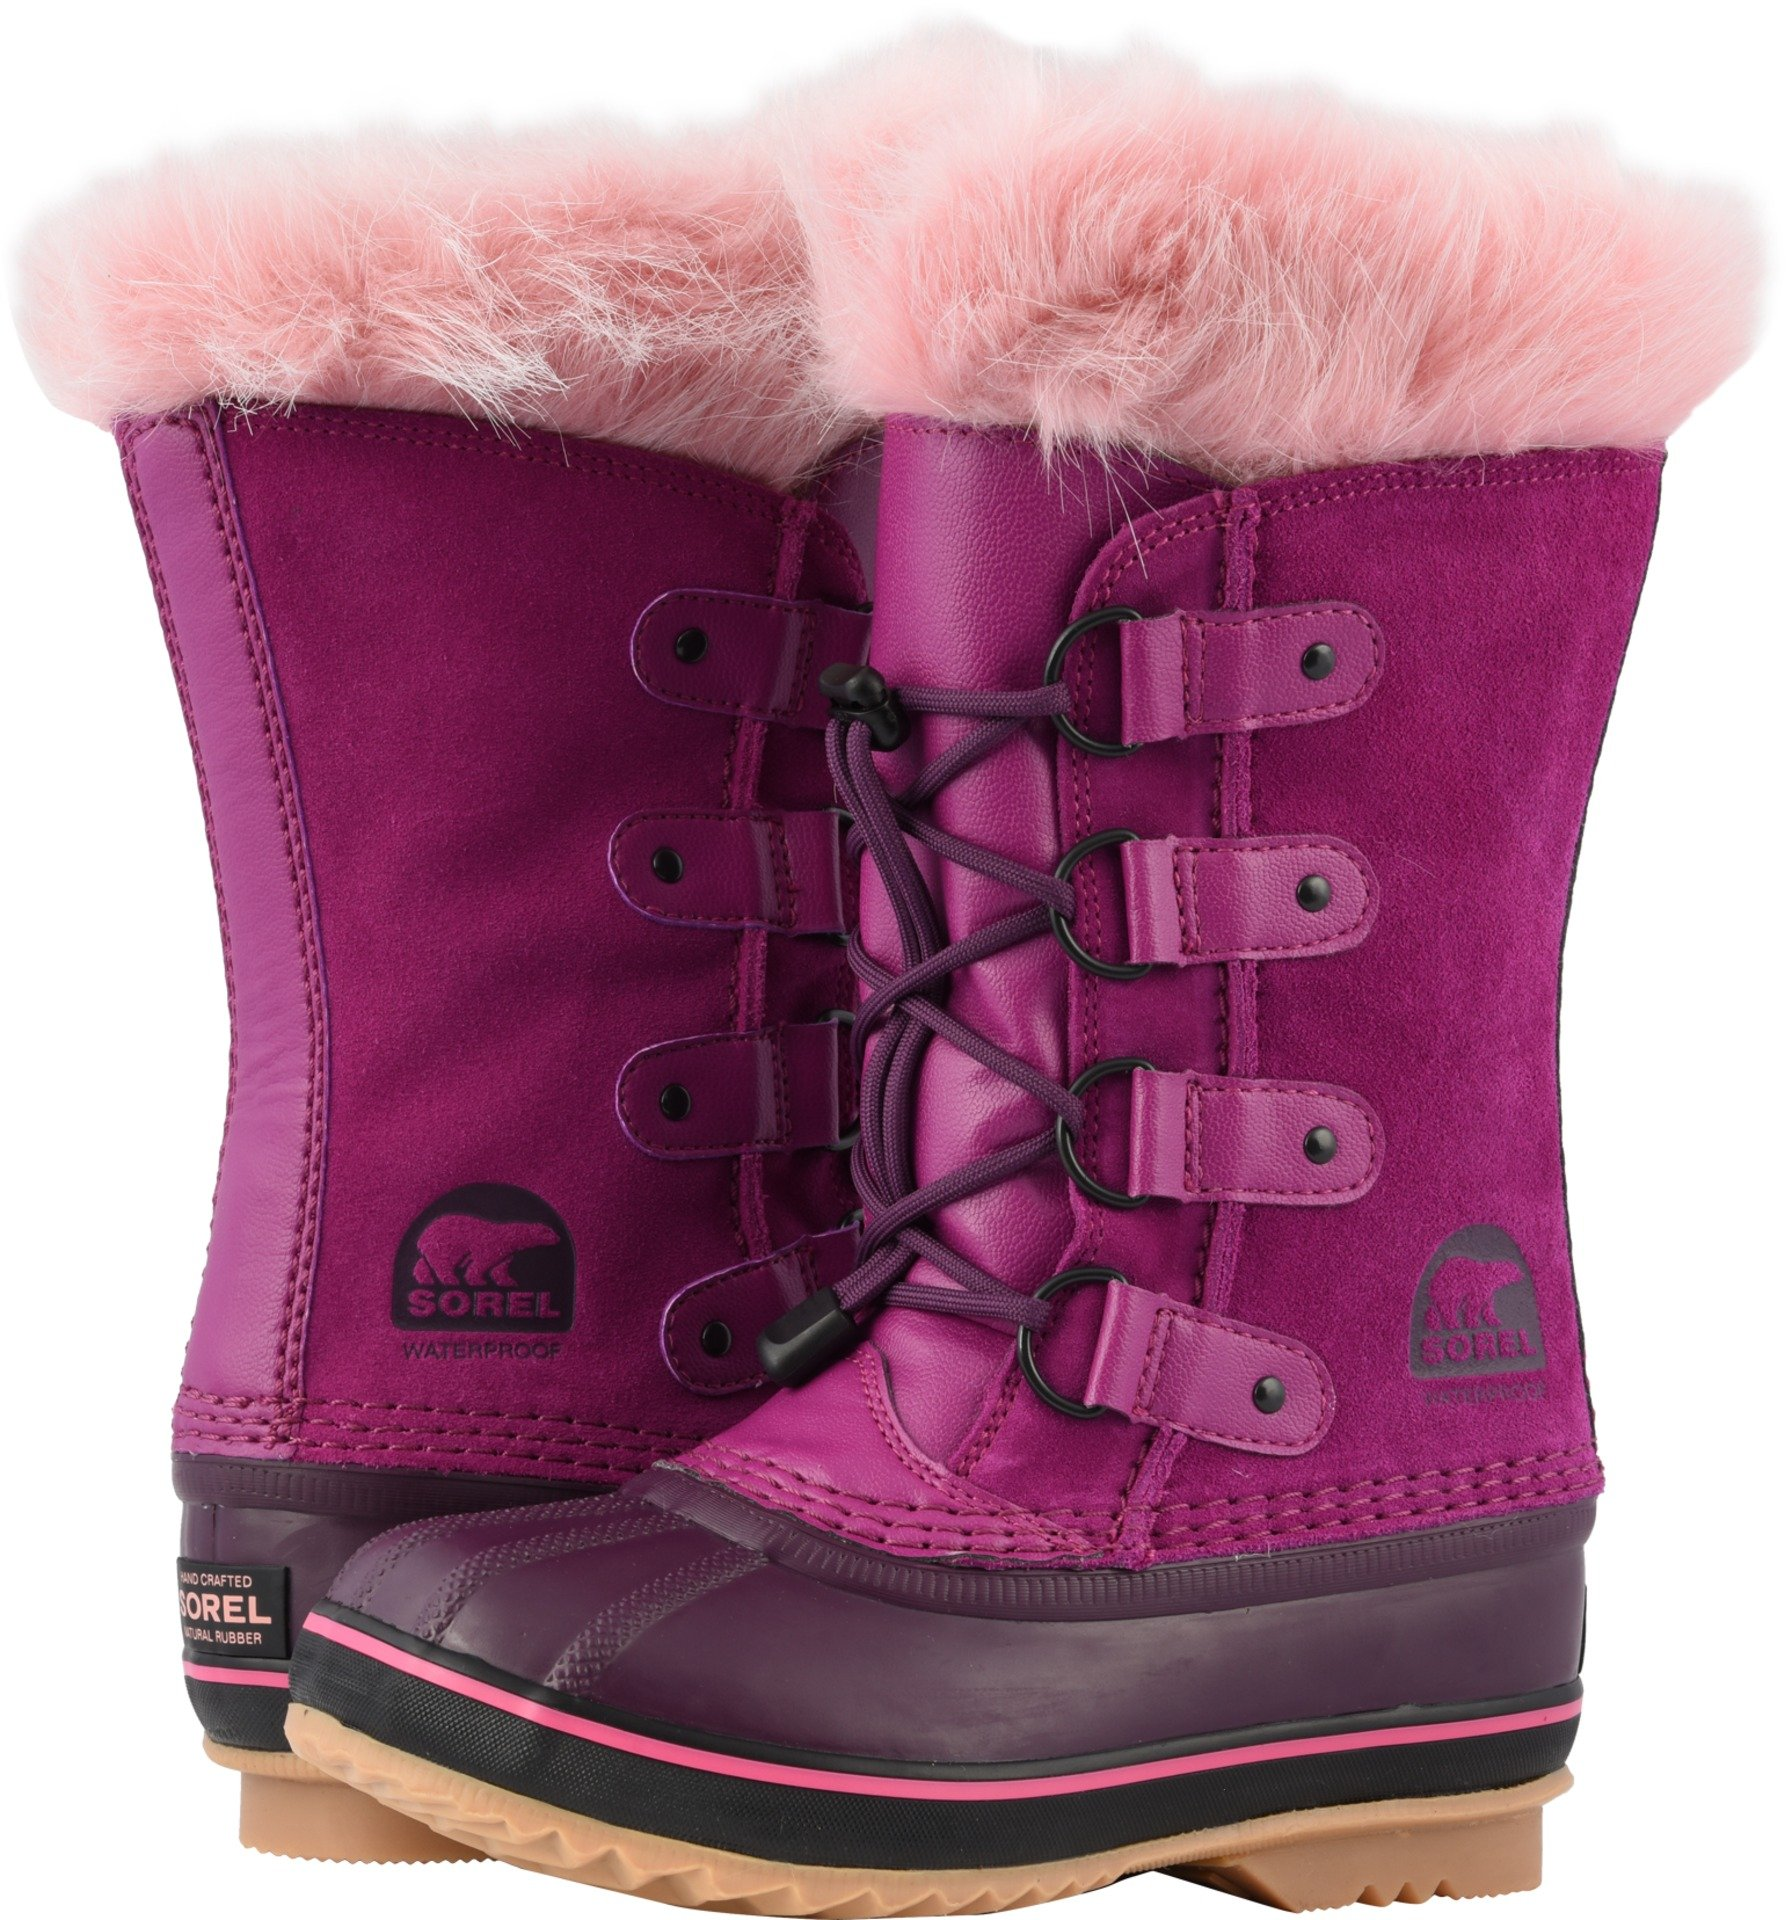 768932da4119 Galleon - SOREL Youth Joan Of Arctic Snow Boot